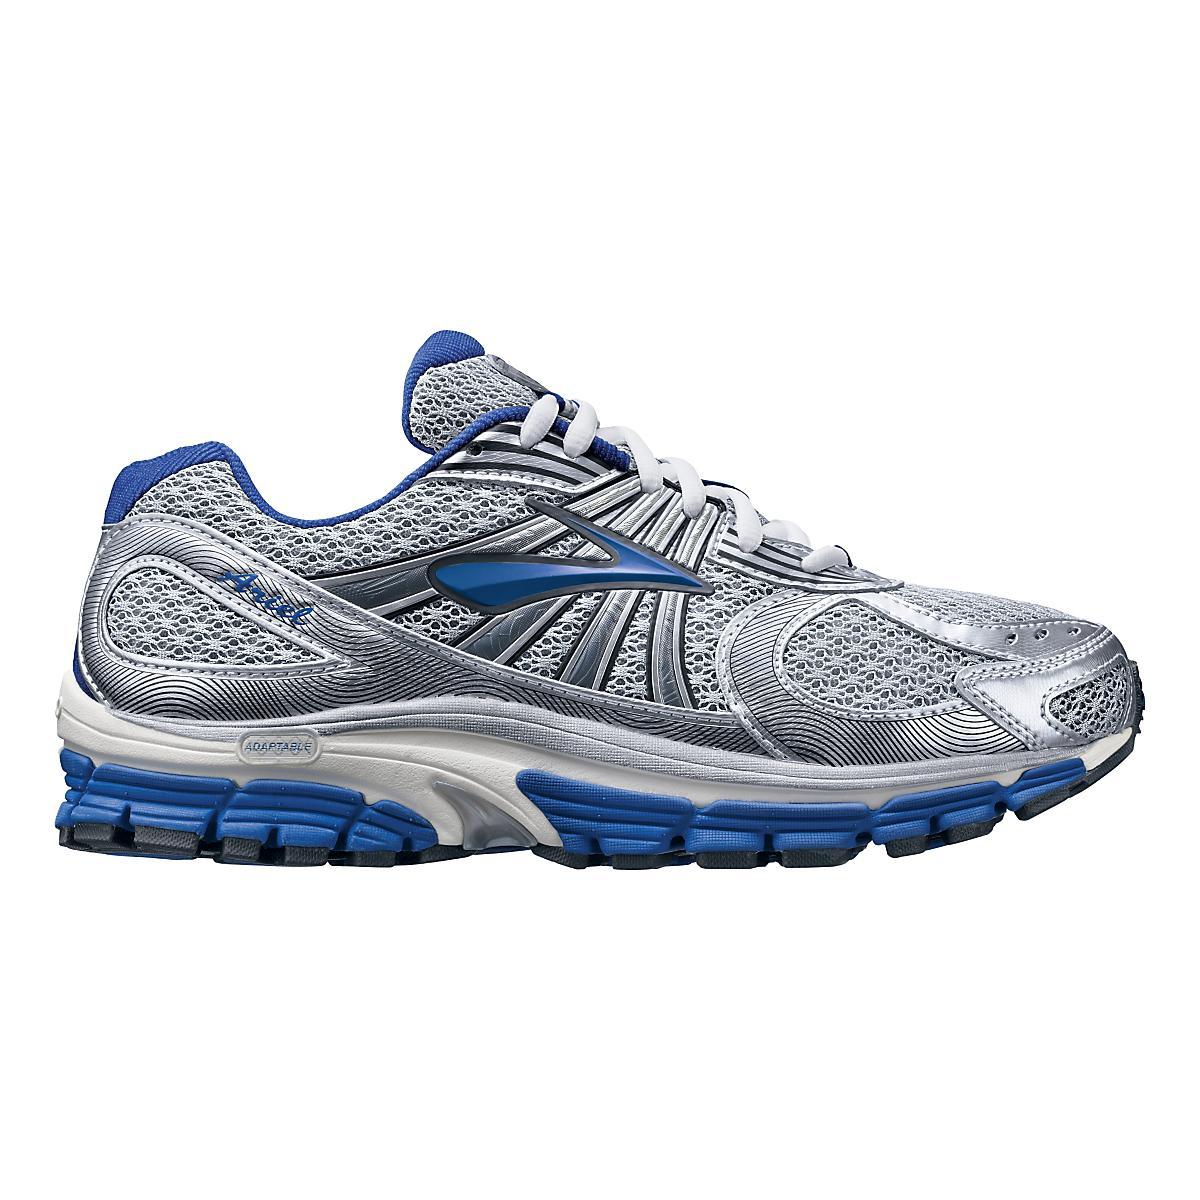 4355ee66826 Womens Brooks Ariel 12 Running Shoe at Road Runner Sports